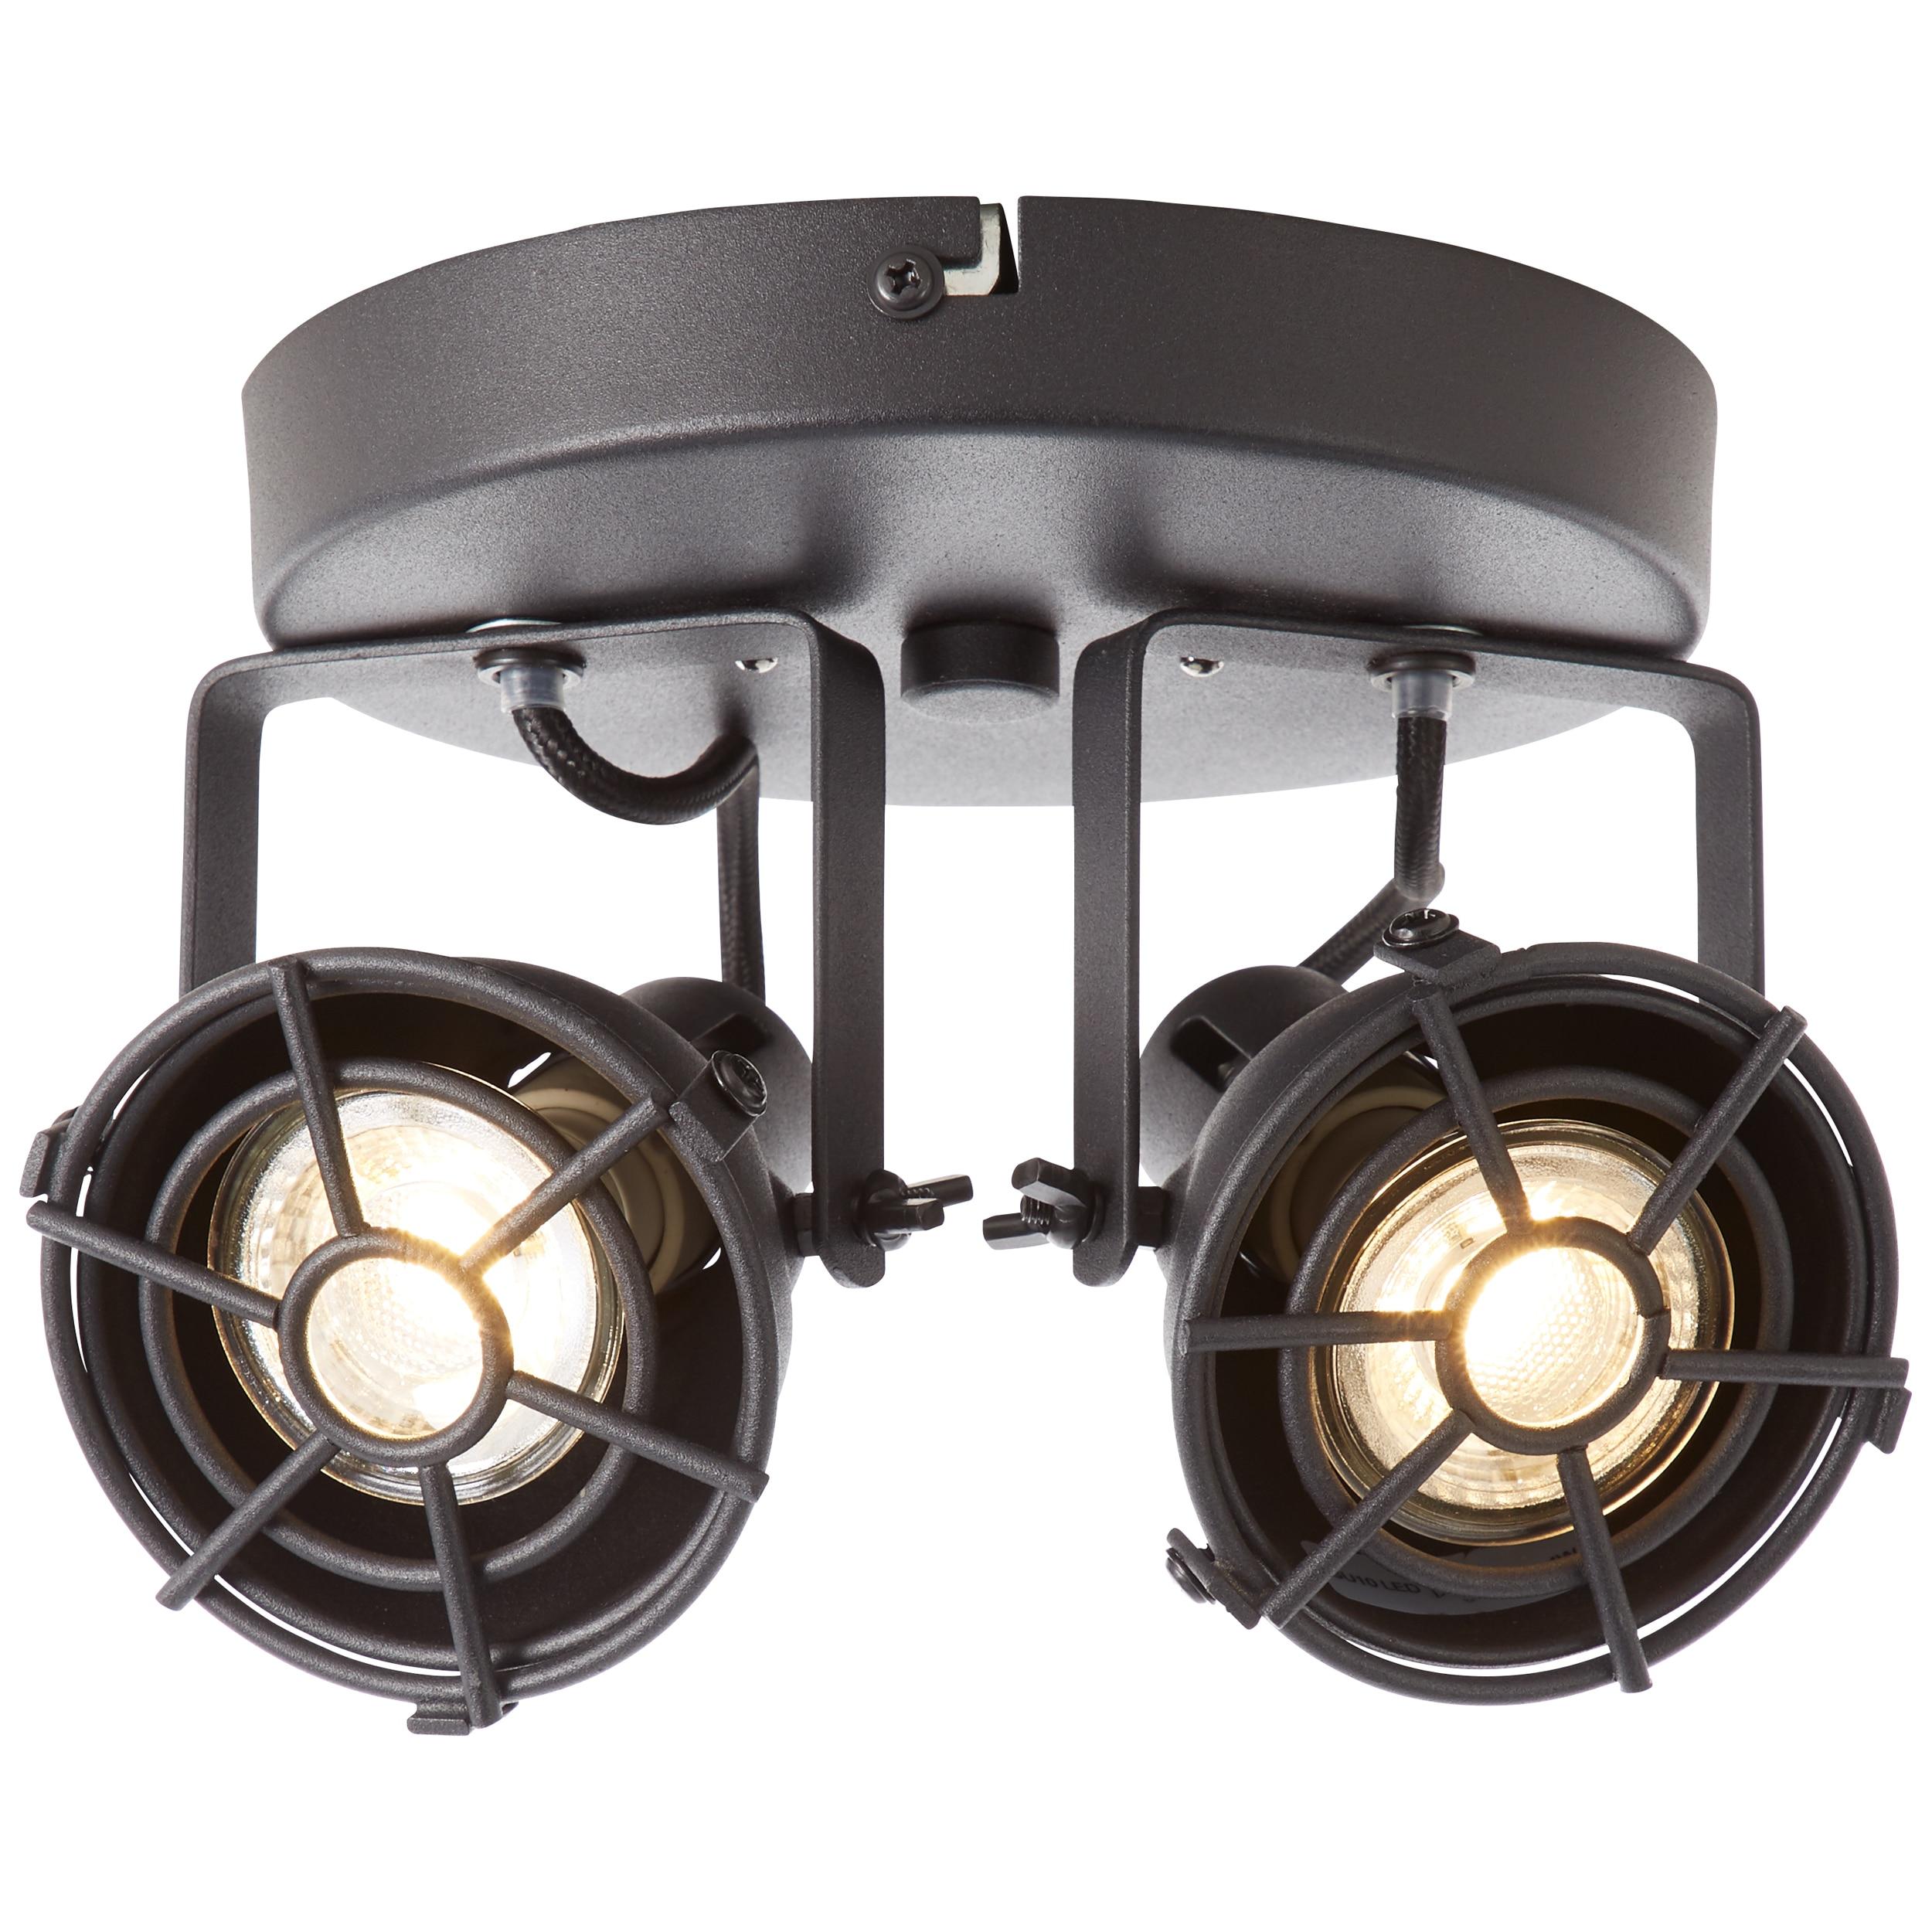 Brilliant Leuchten Jesper LED Spotrondell 2flg schwarz korund